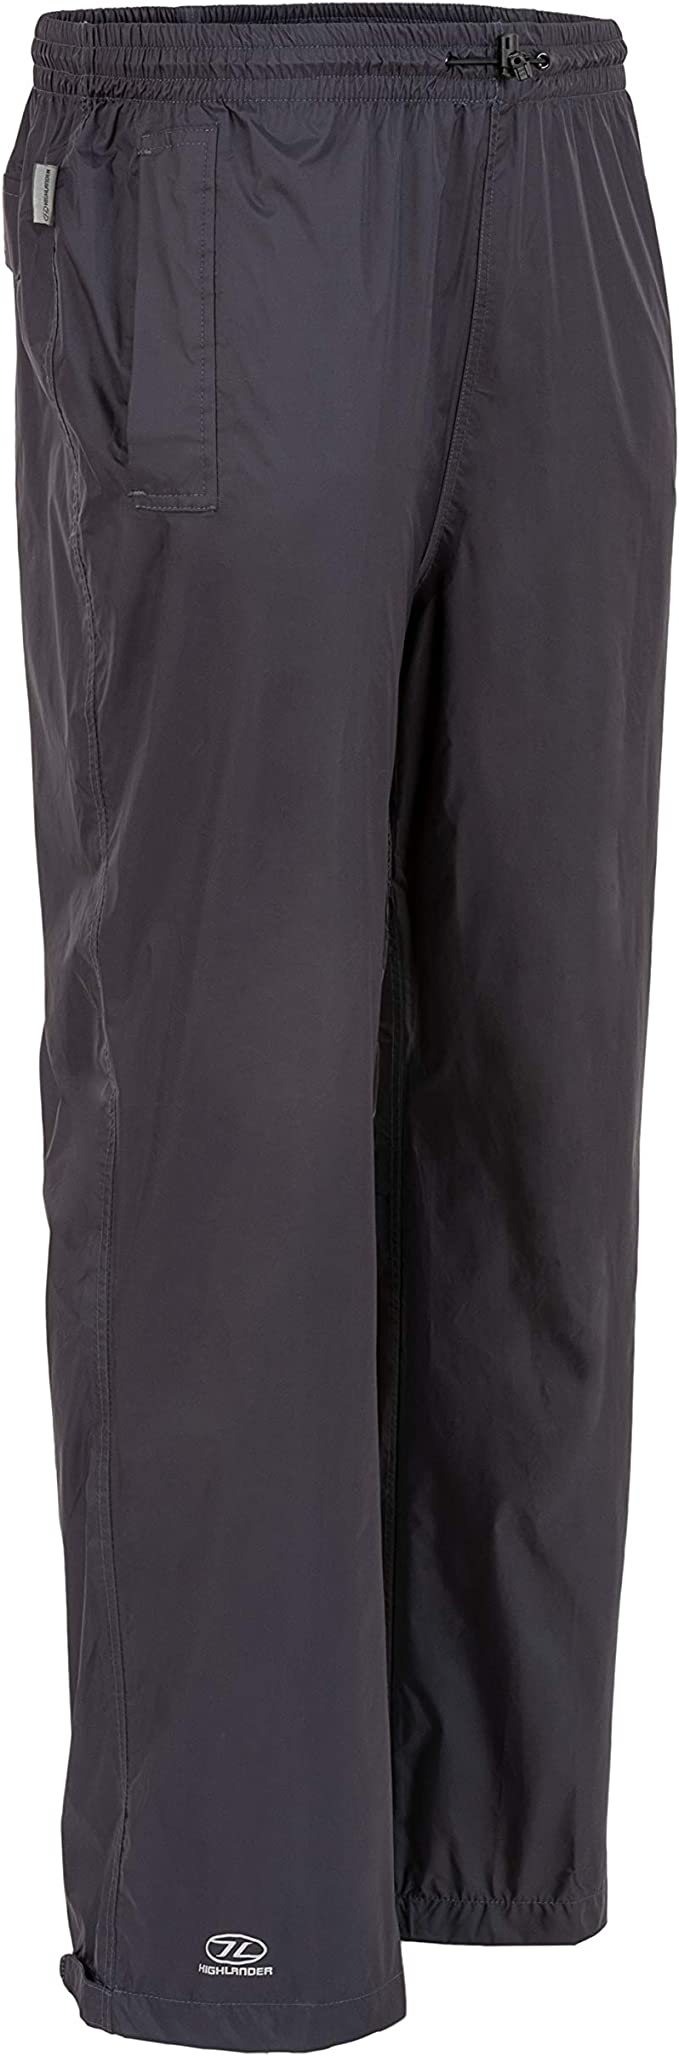 Pantaloni Impermeabili e Tascabili Uomo Highlander Scotland Stow /& Go